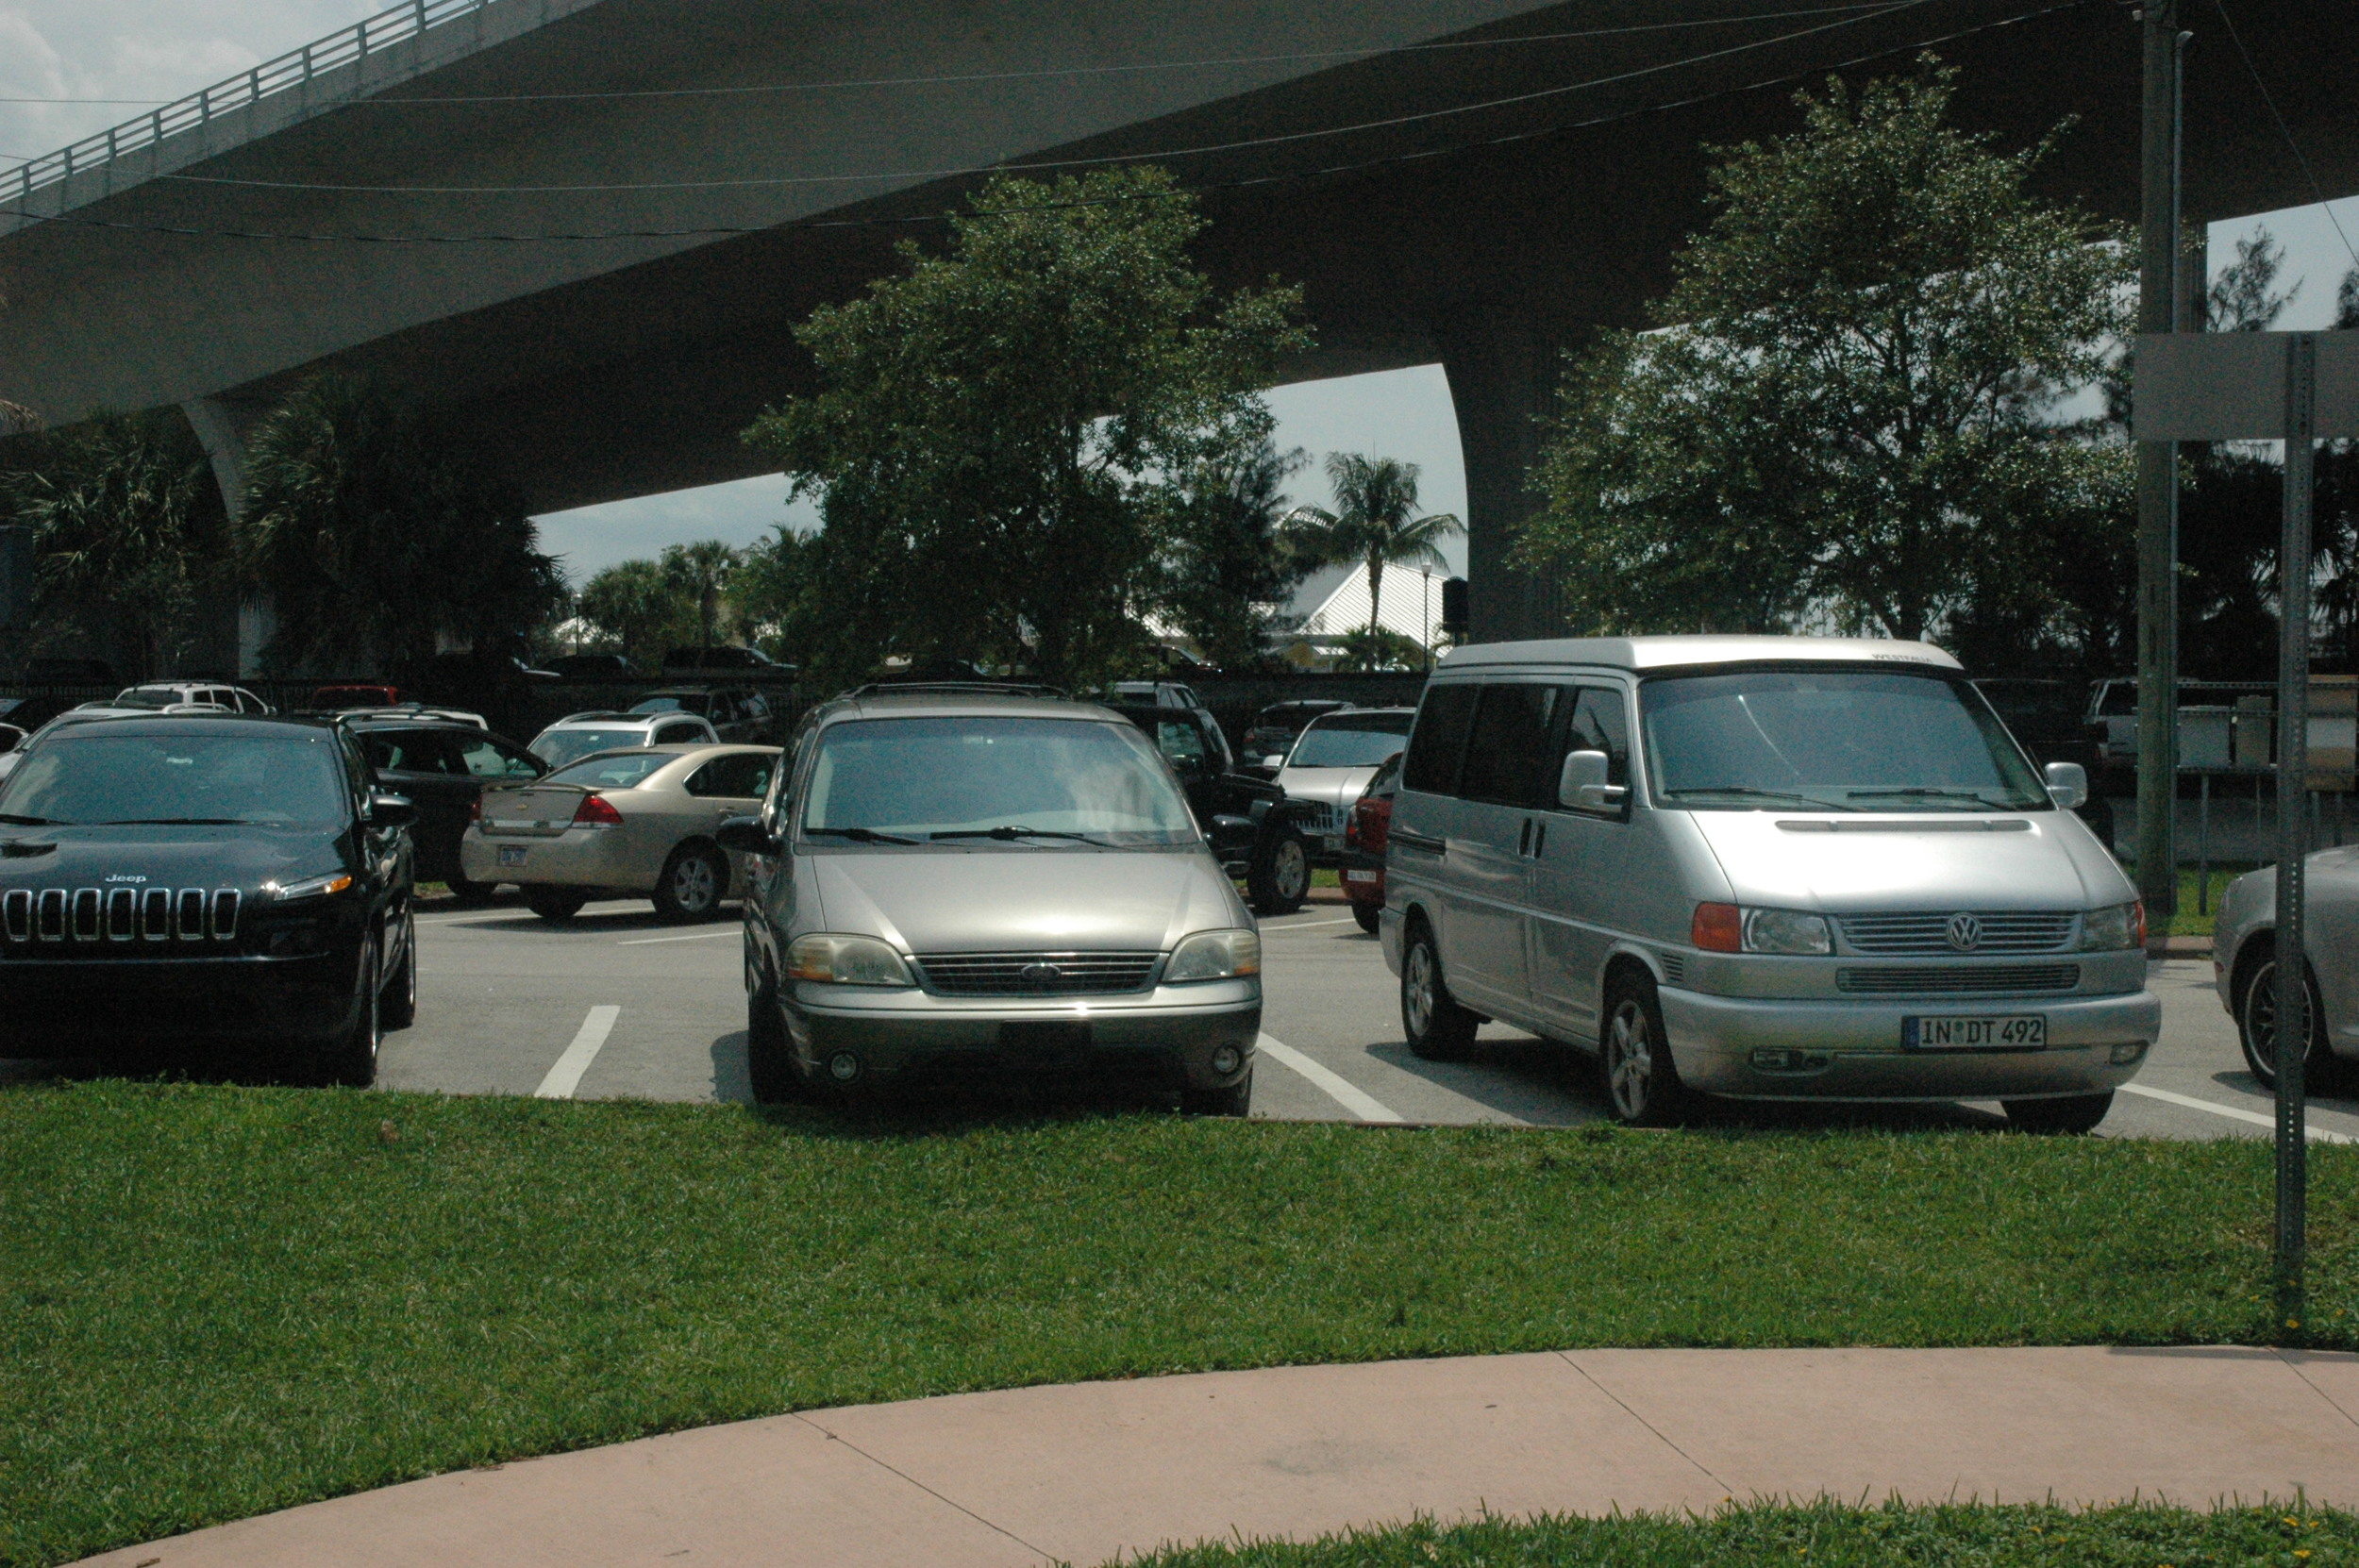 Above: Generously wide parking spaces. Stuart, Florida.